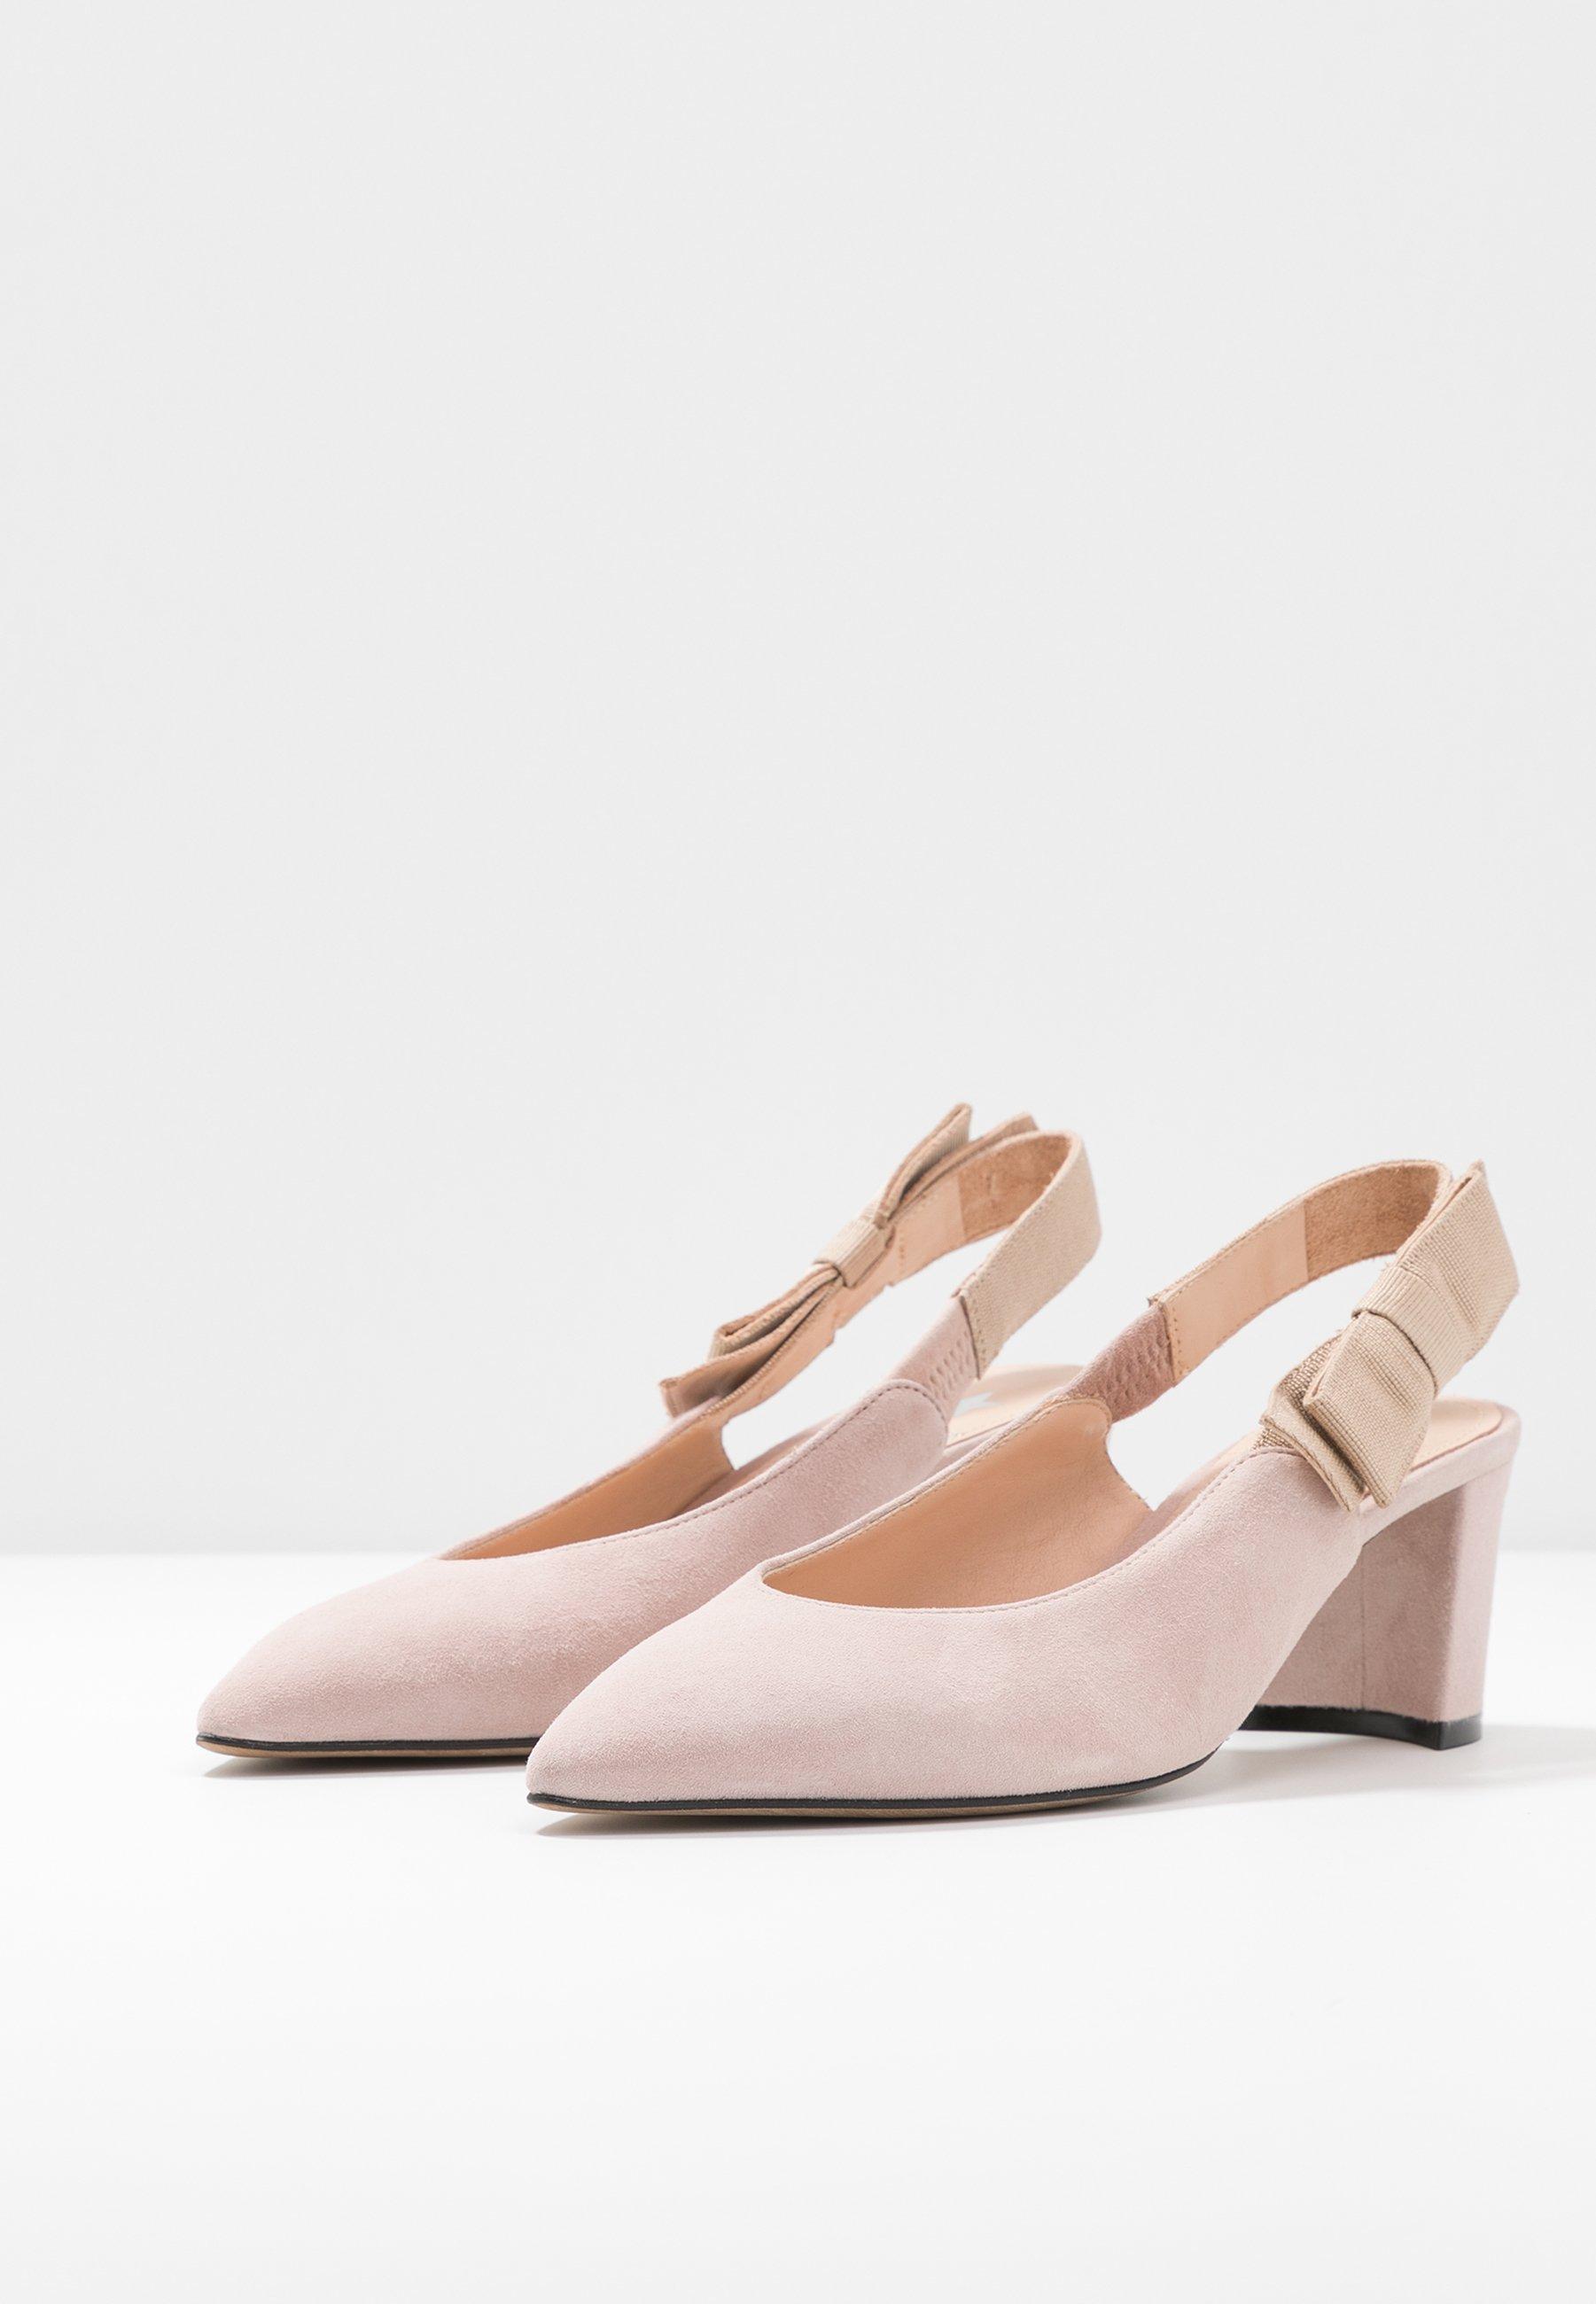 Maripé Pumps - light pink